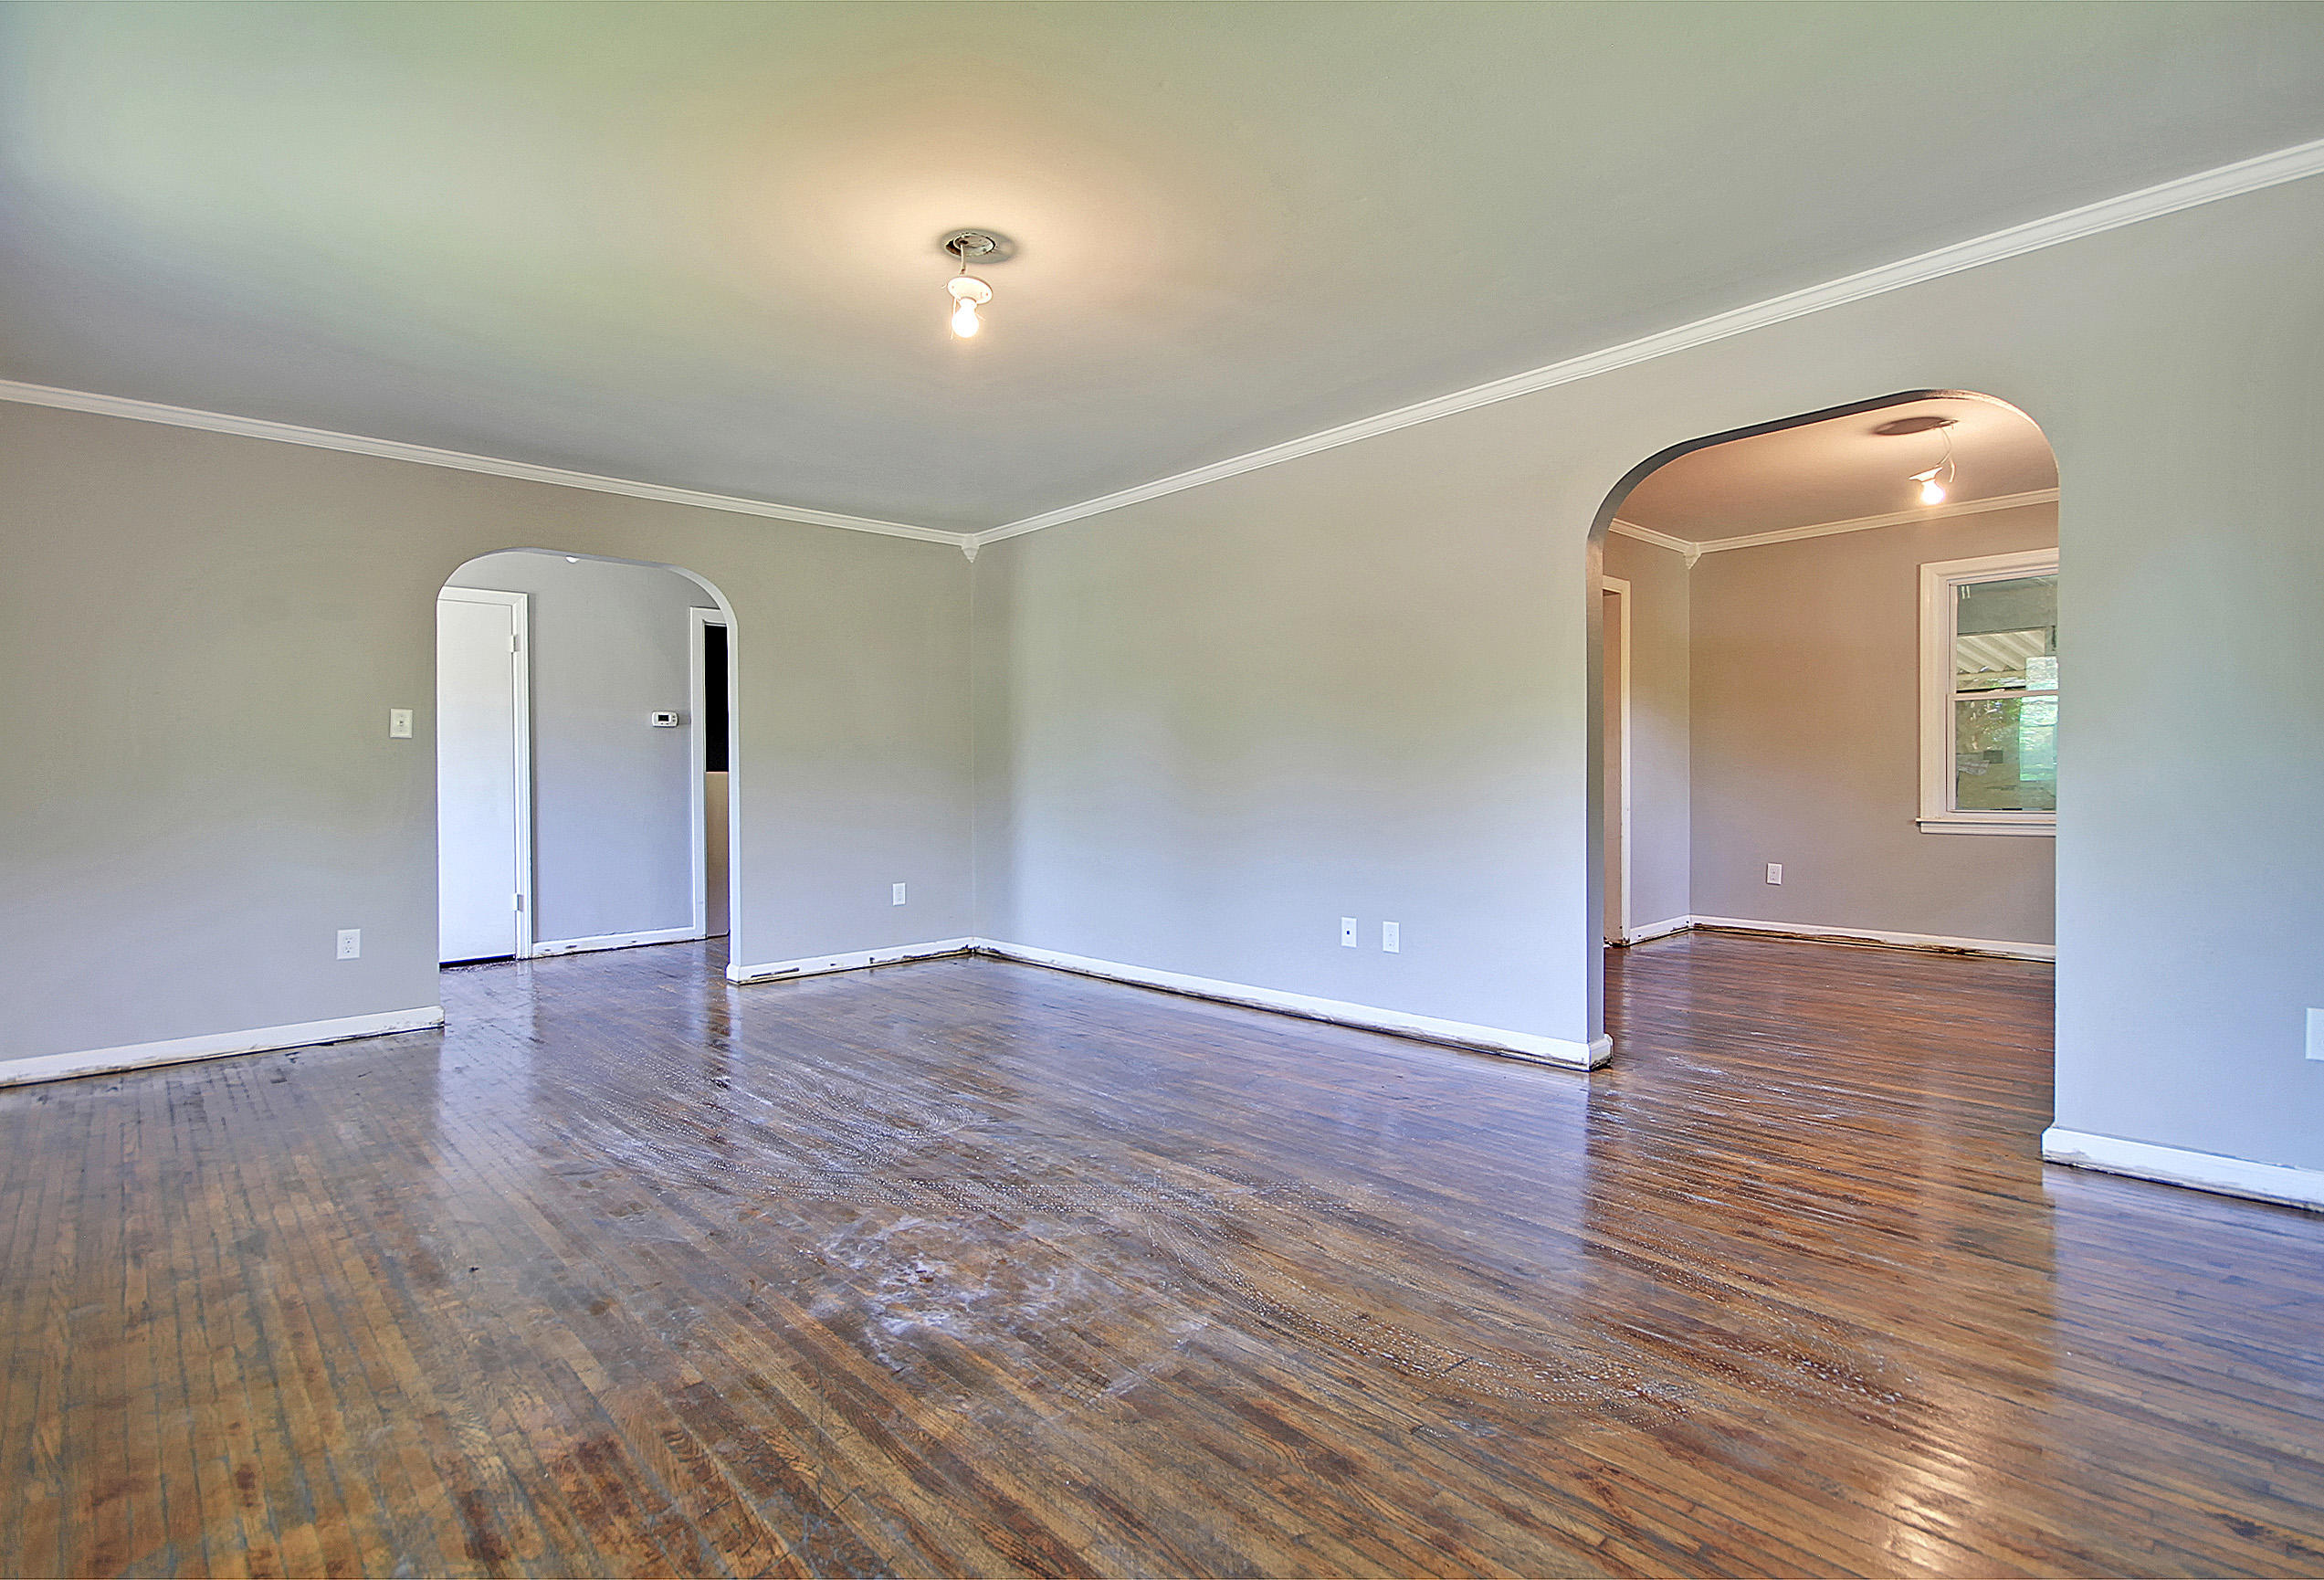 Northbridge Terrace Homes For Sale - 1094 Northbridge, Charleston, SC - 11